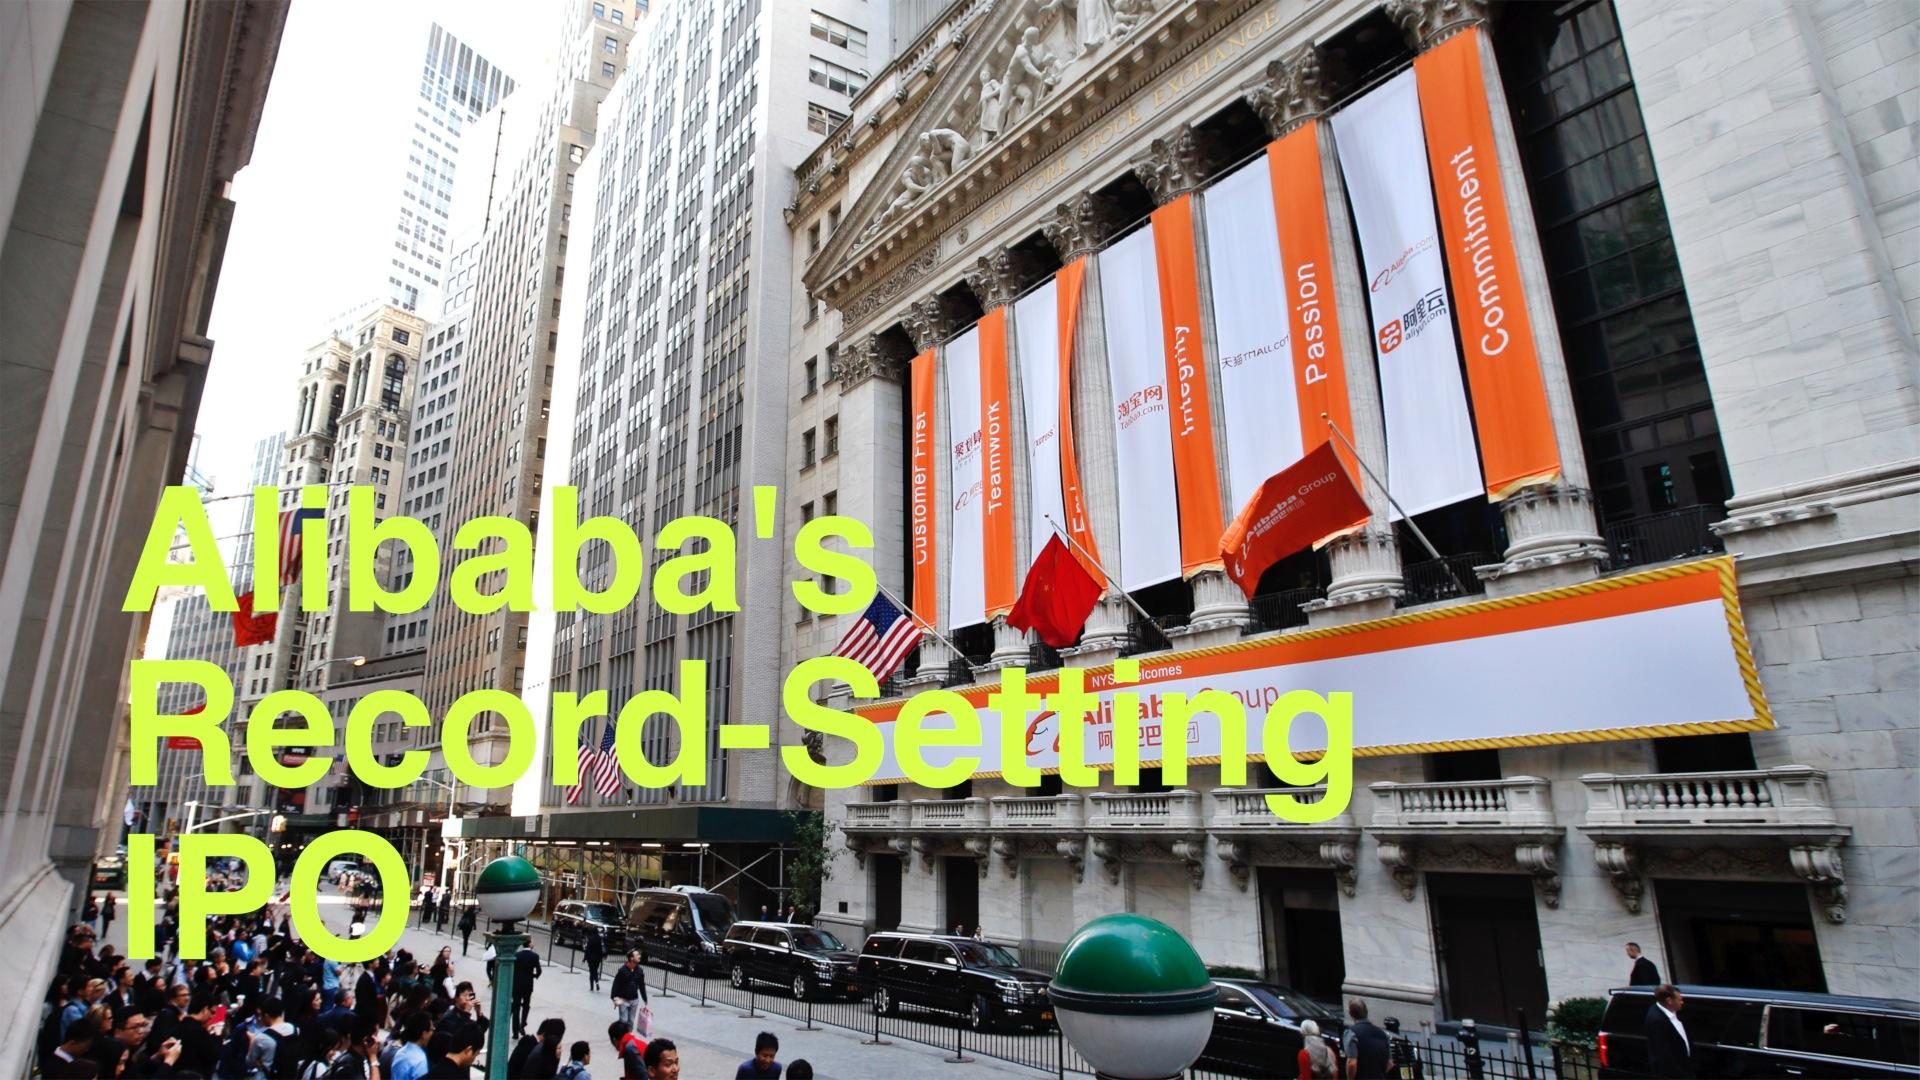 Alibaba's Record-Setting IPO